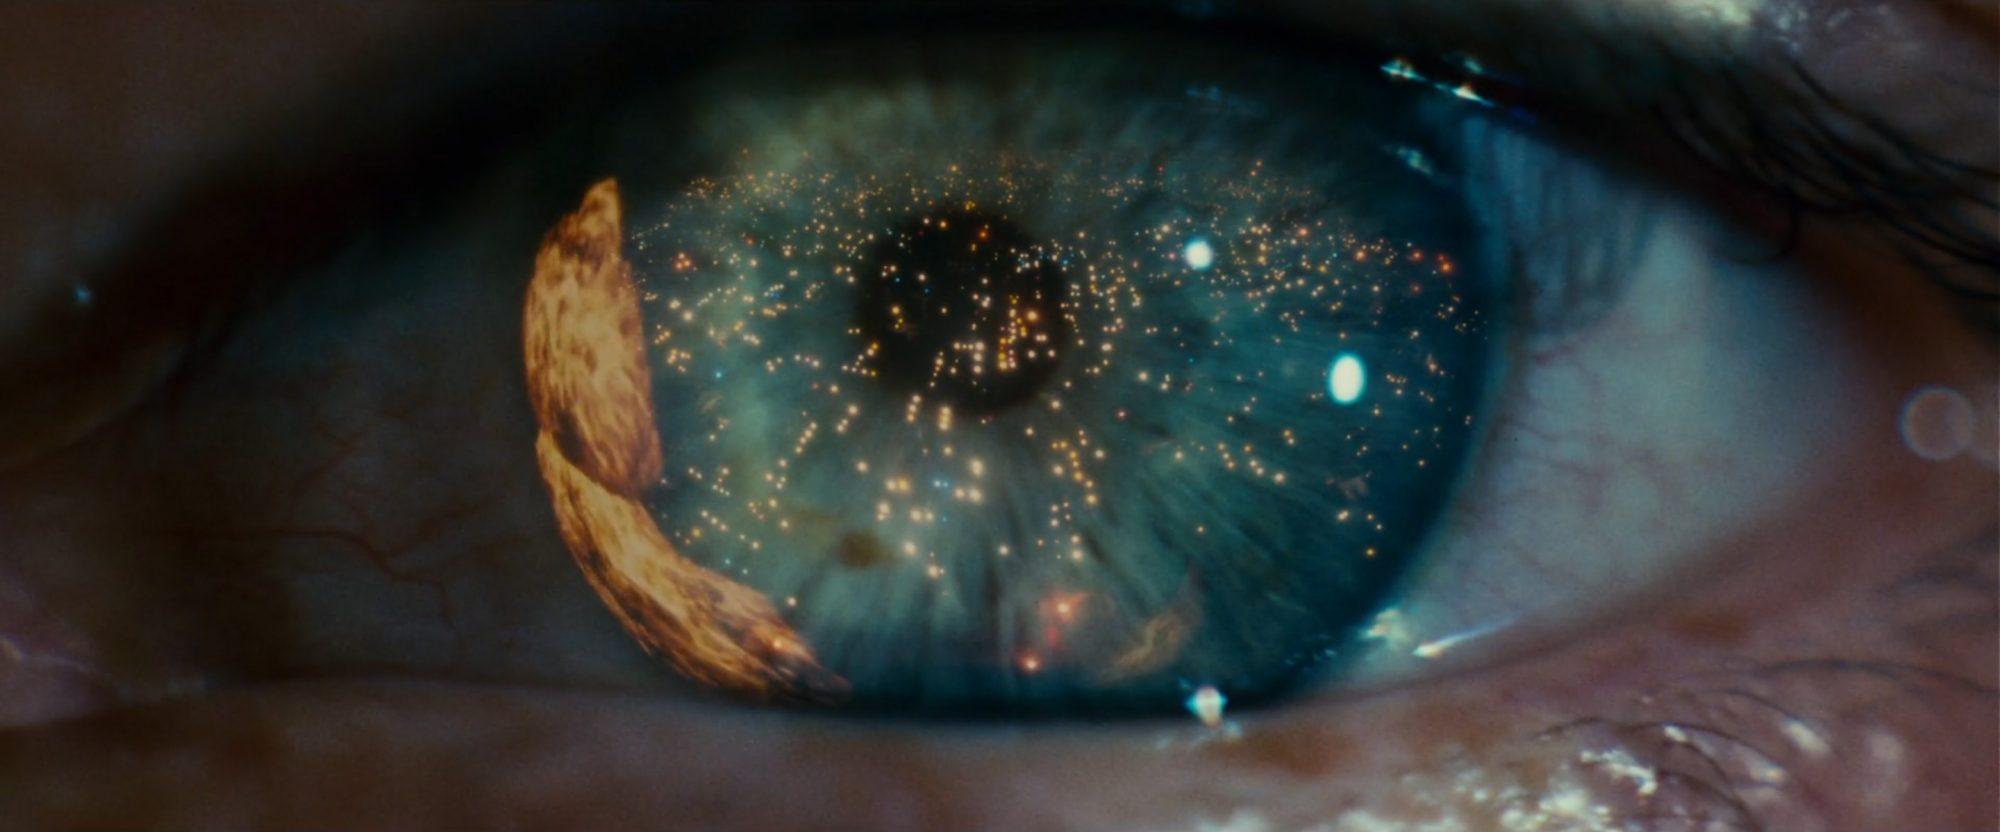 Ridley Scott, closeup of eye, beginning of blade runner movie